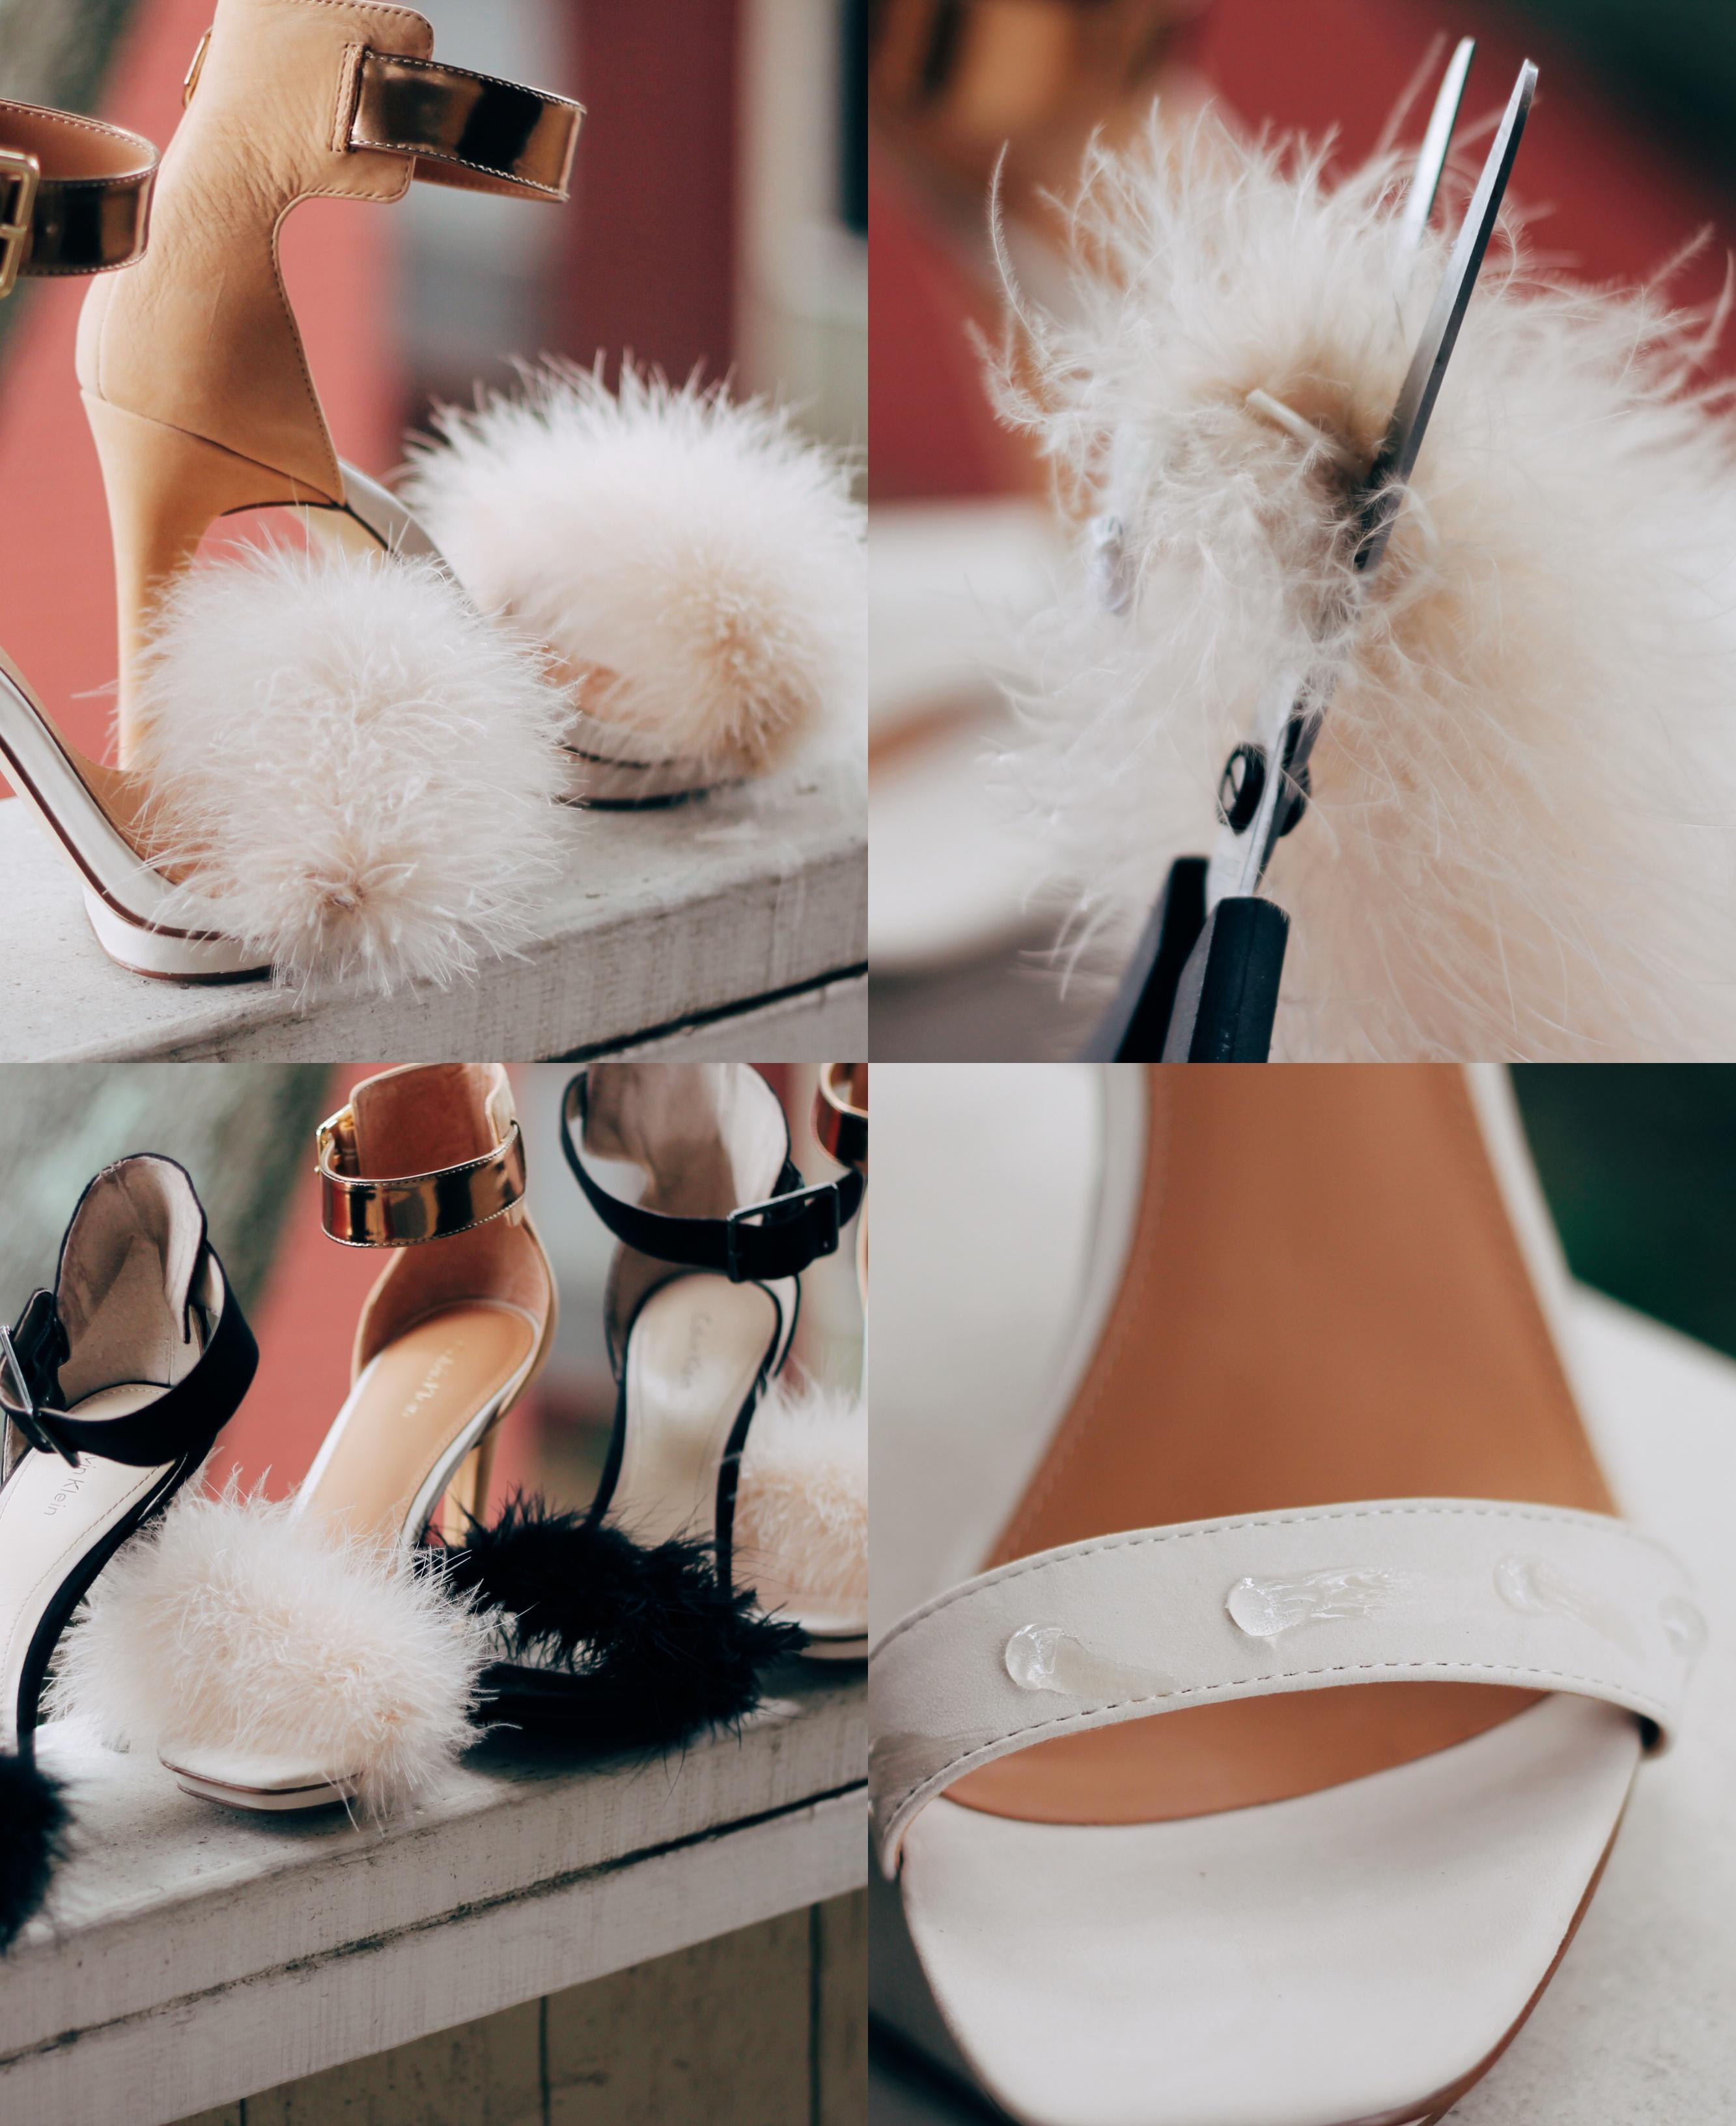 diy how to make faux fur strappy heeled sandals TOPSHOP Pink Rabbit Faux-Fur Fluffy Sandals, kim kardashian fur shoes, how to make pretty shoes, lifestyle blogger, houston blogger, ugandan blogger, fashion blogger